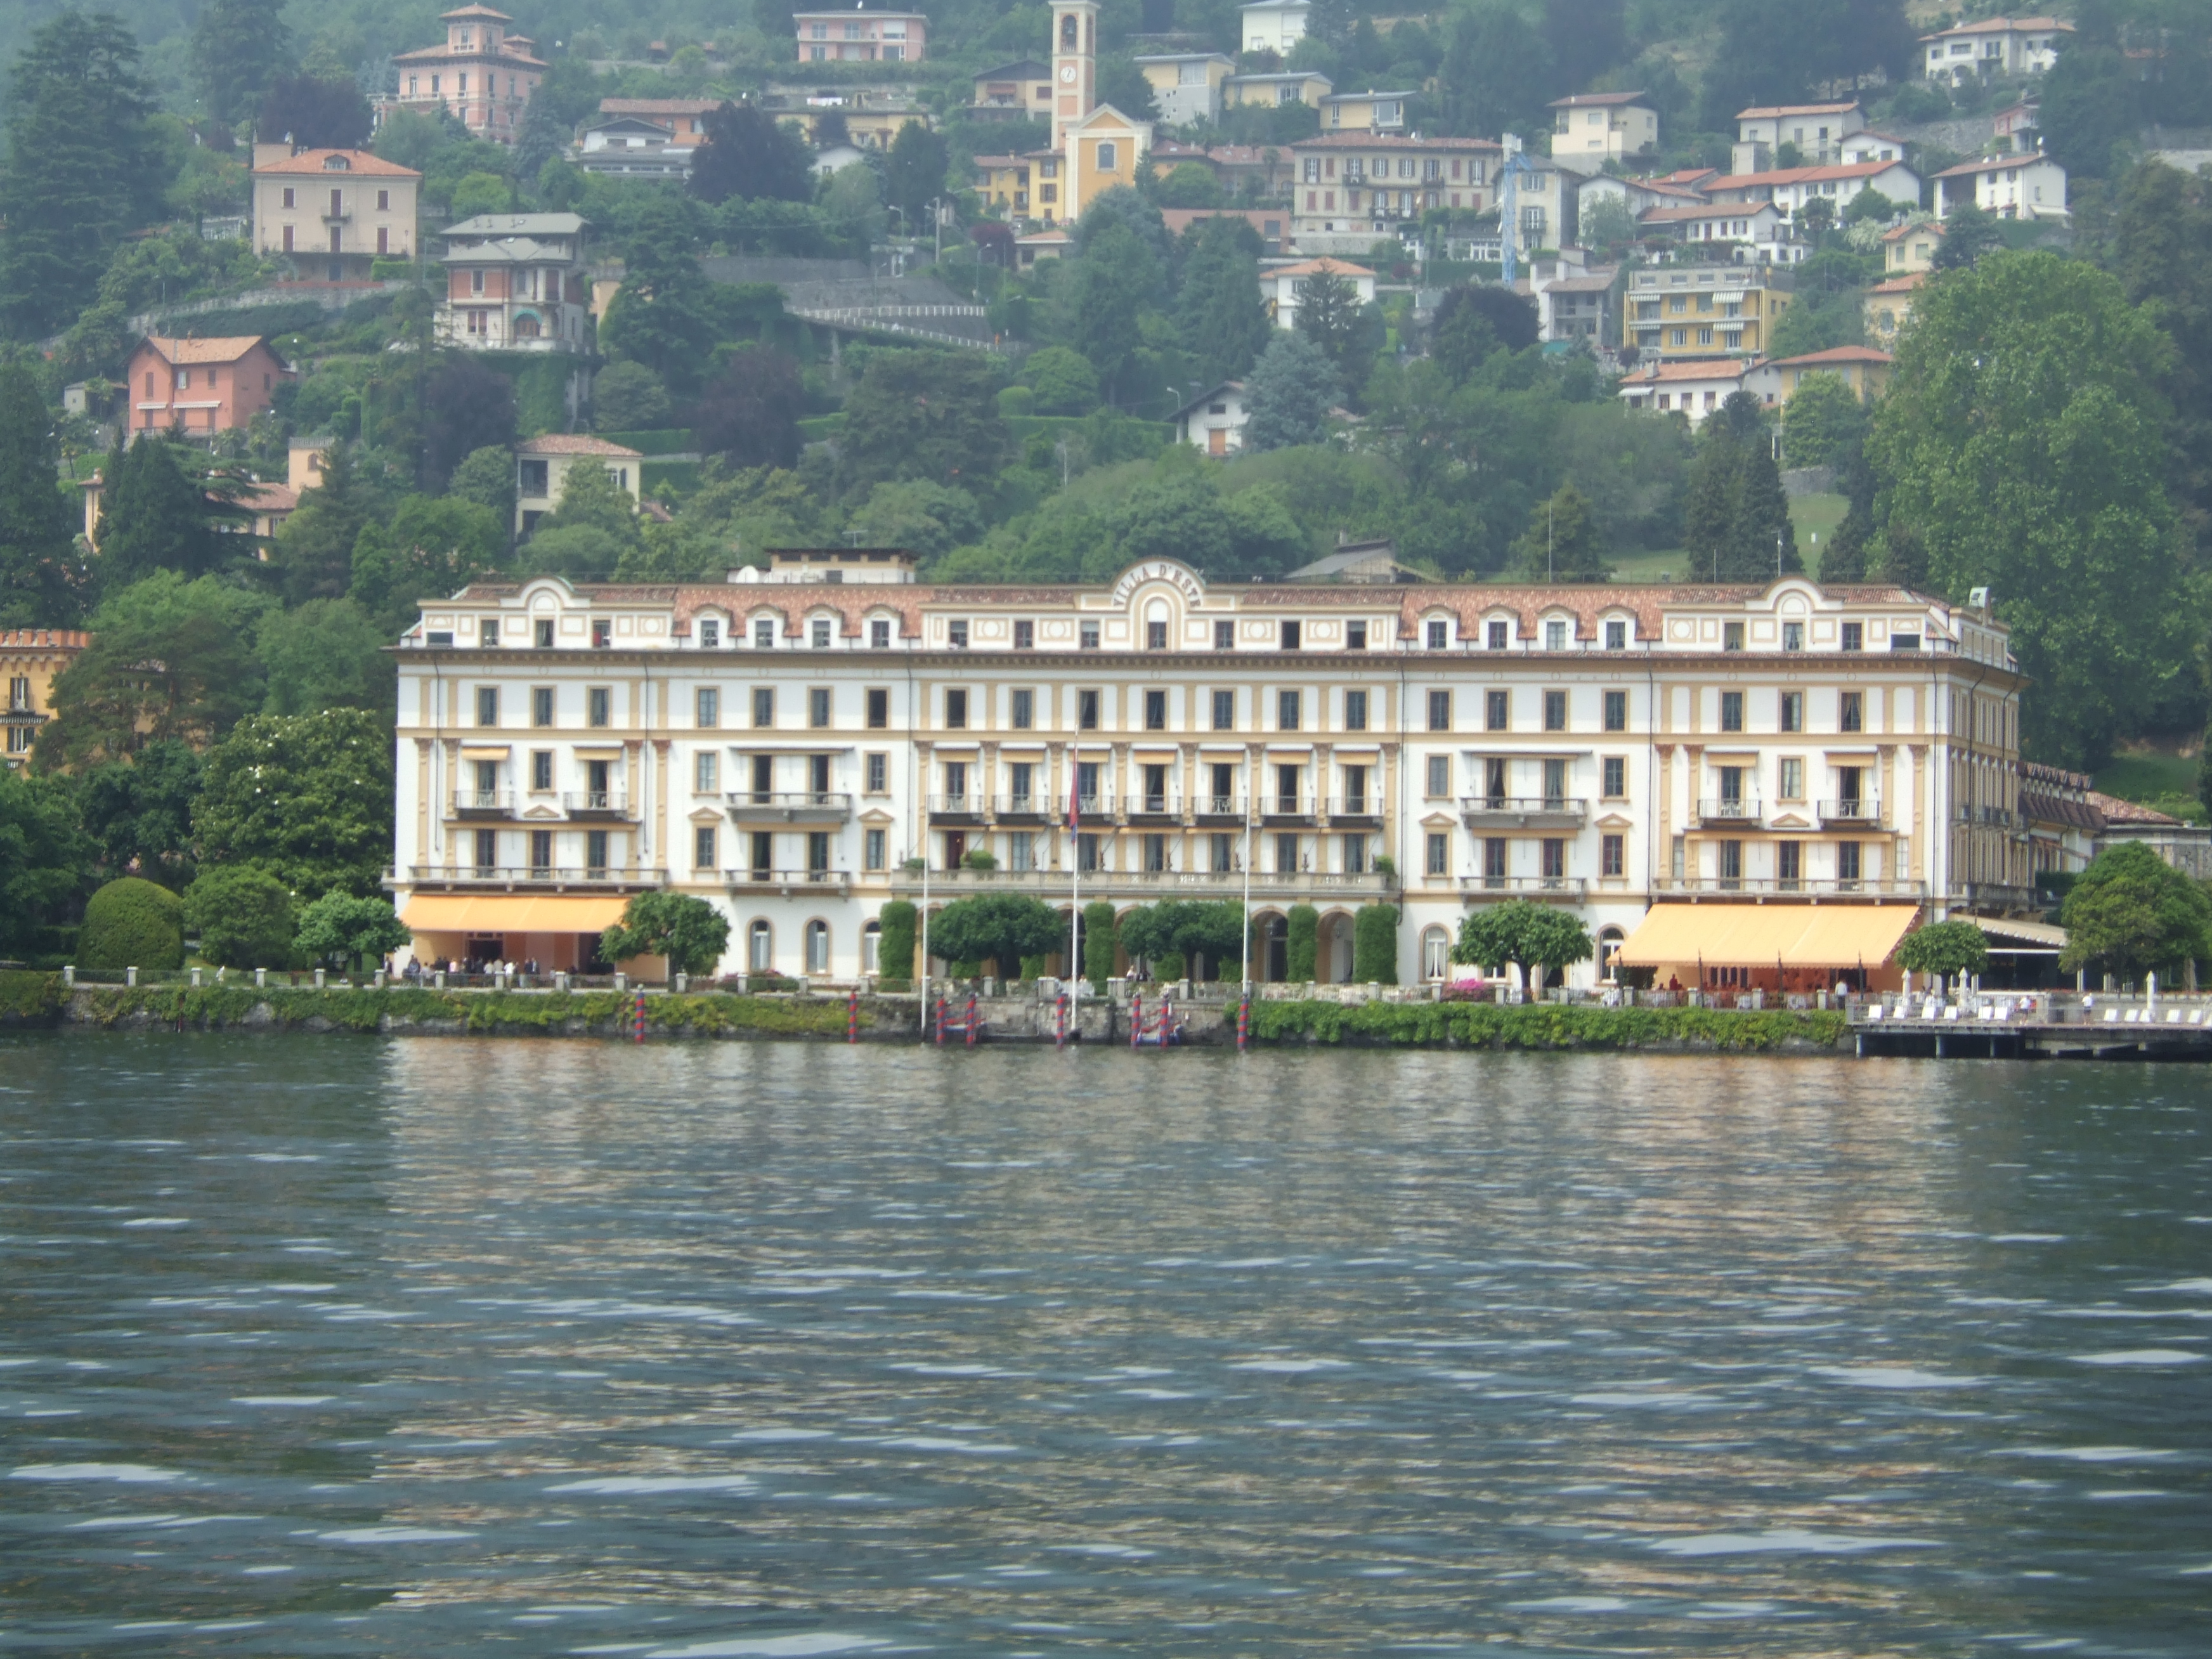 Milano Hotel D Este